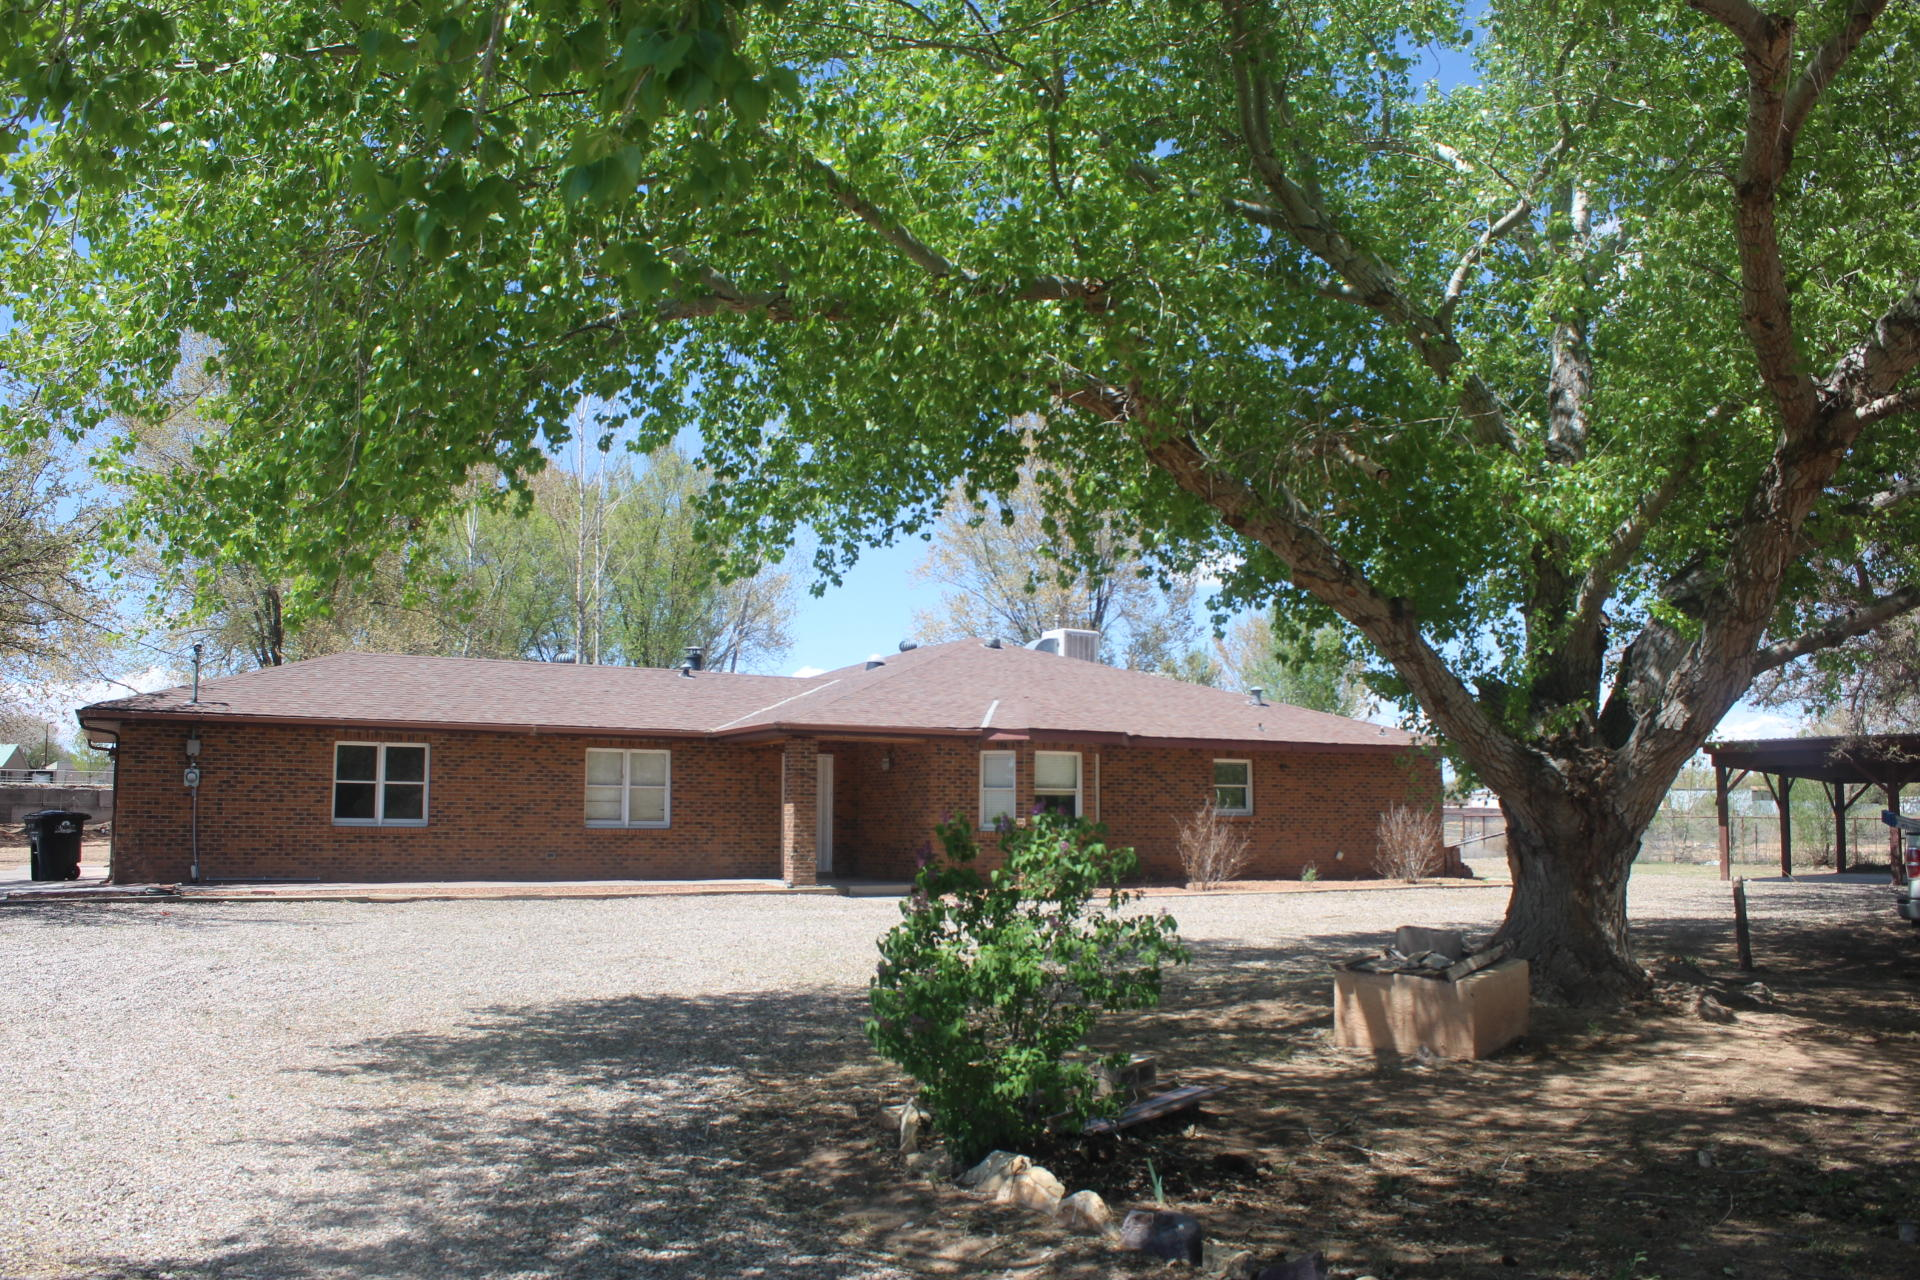 99 Square Deal Road, Los Chavez, NM 87002 - Los Chavez, NM real estate listing